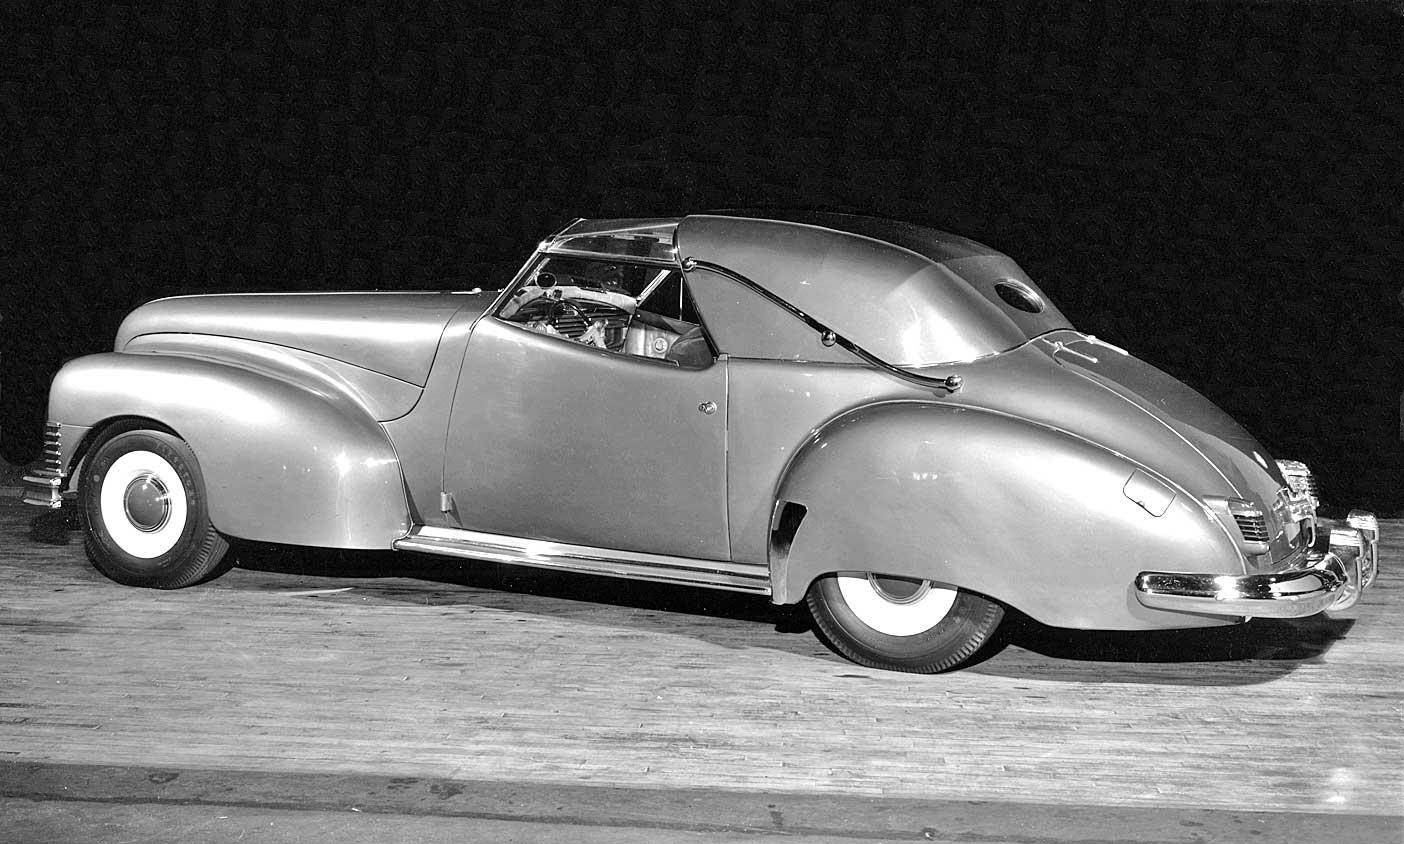 The Three Lives of Edward Macauley s Sleek Packard Phantom